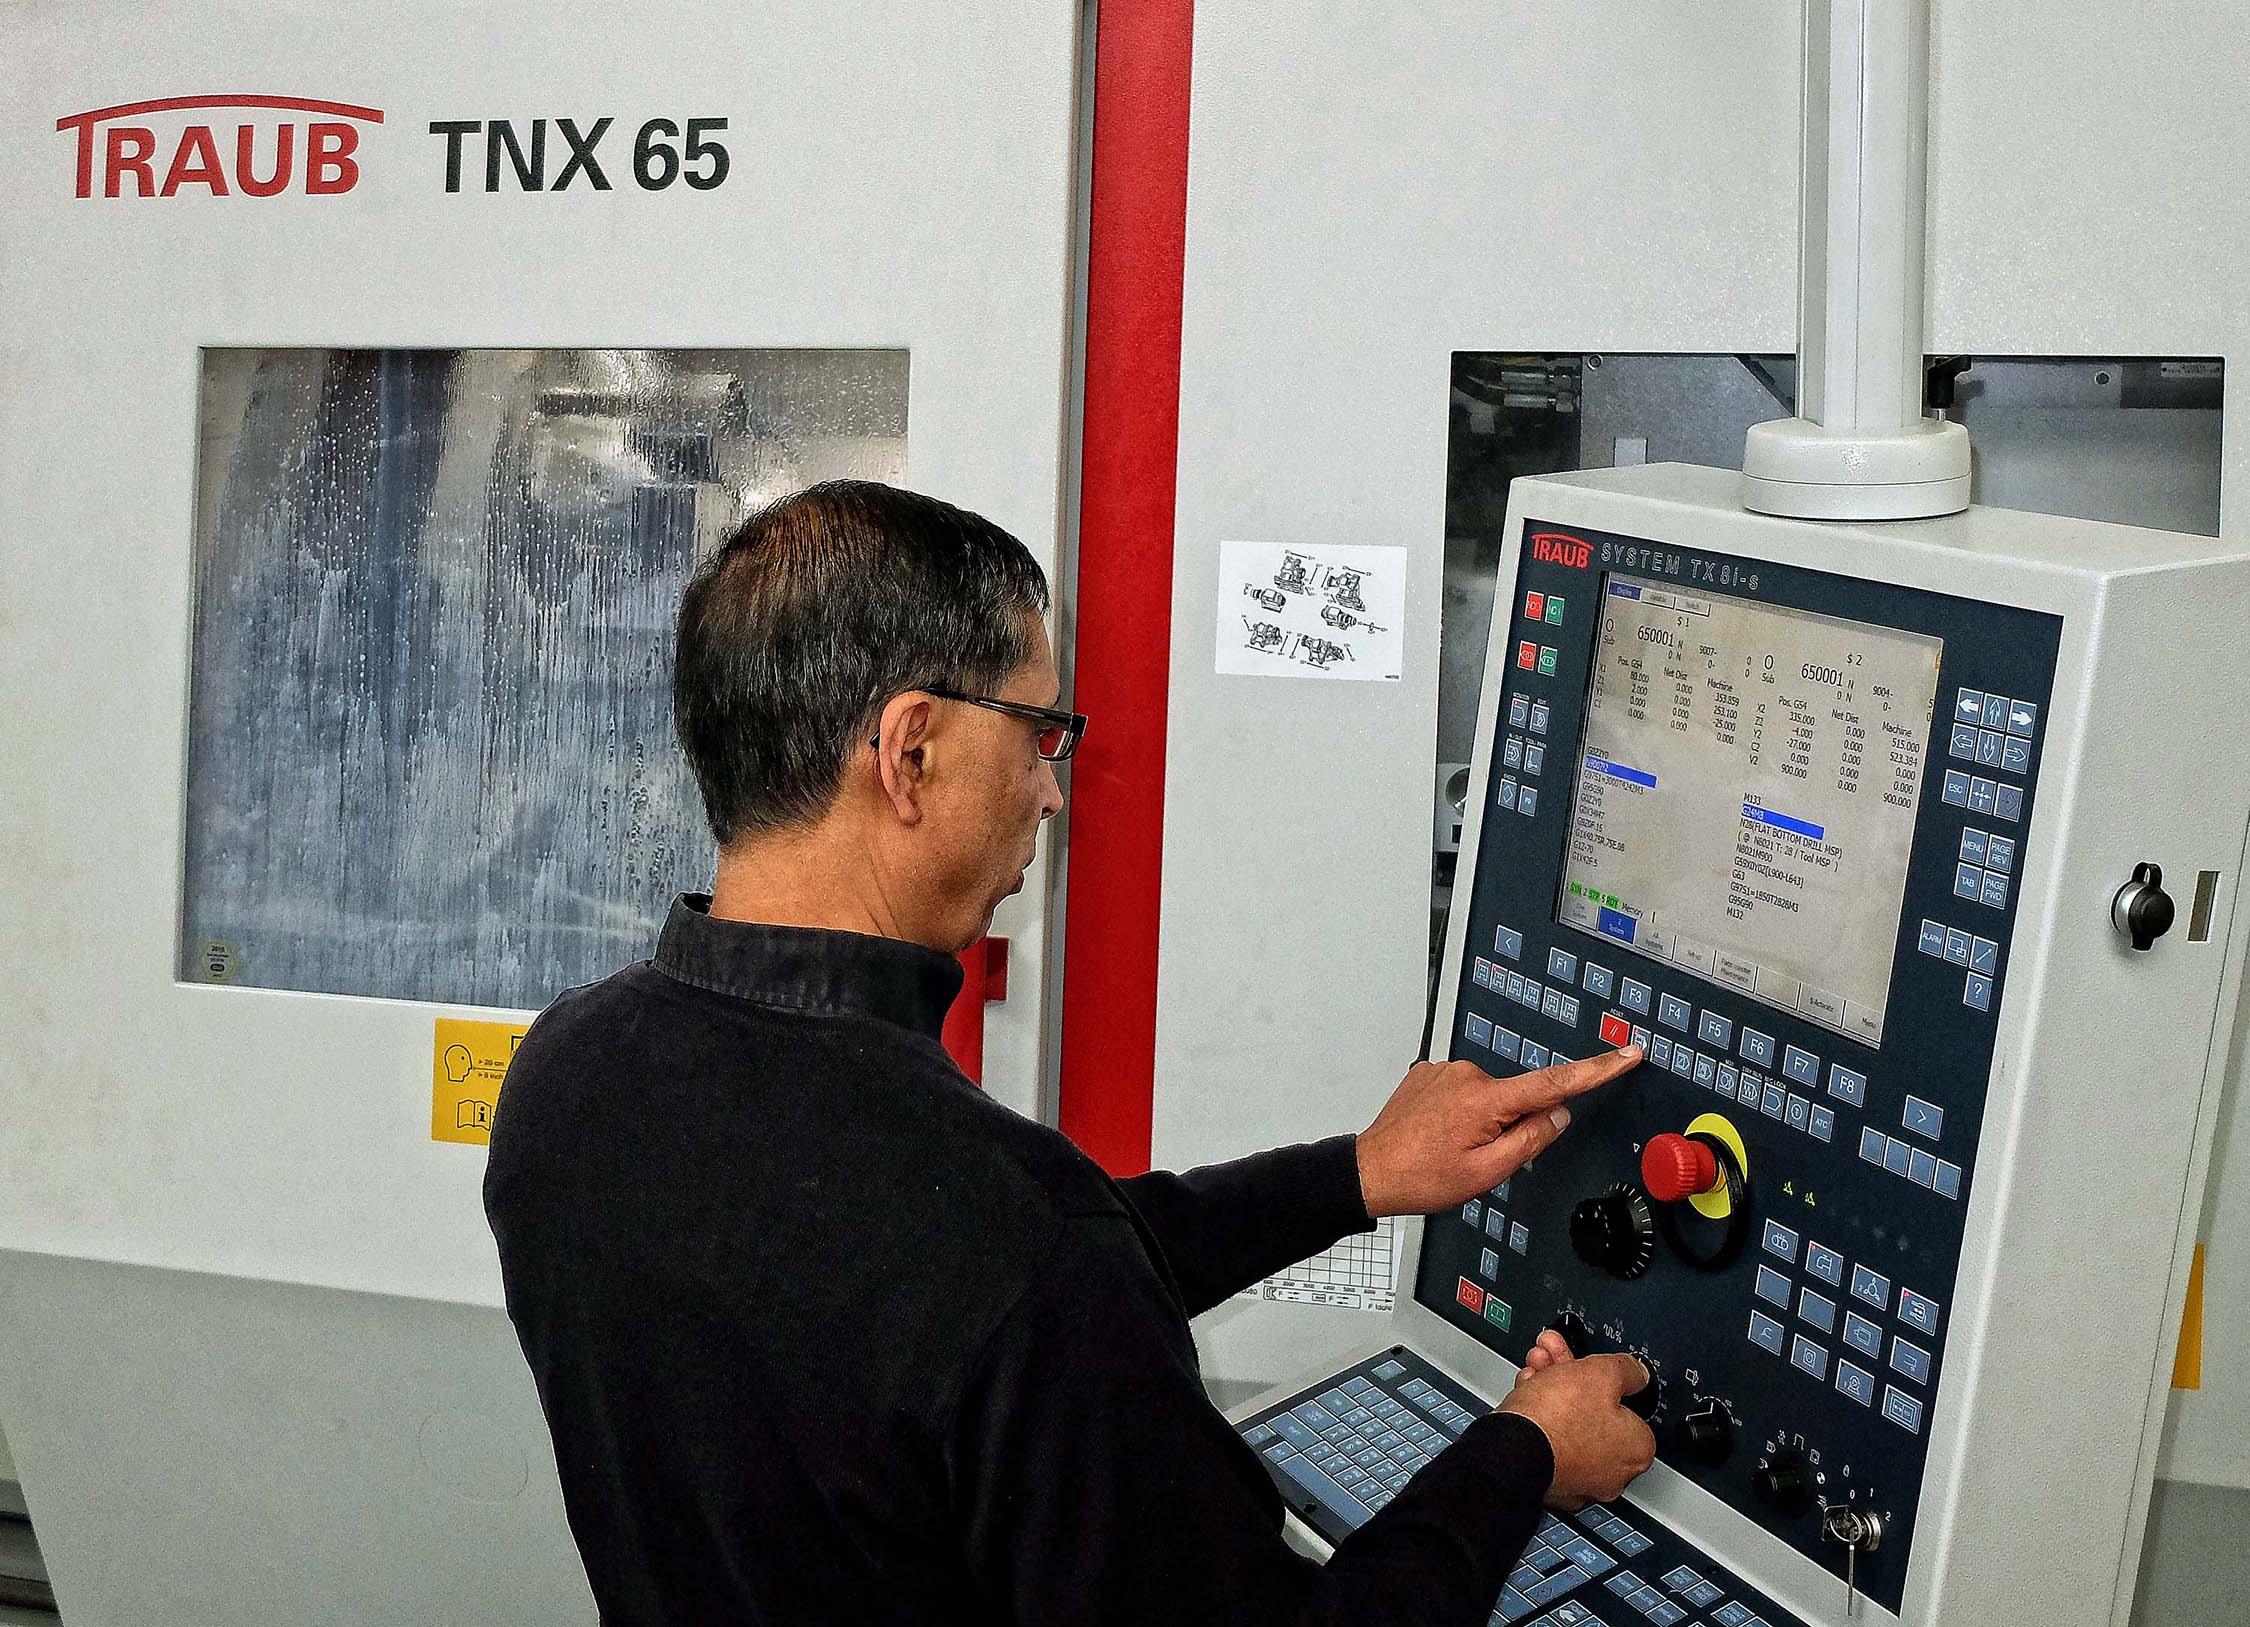 TNX 65